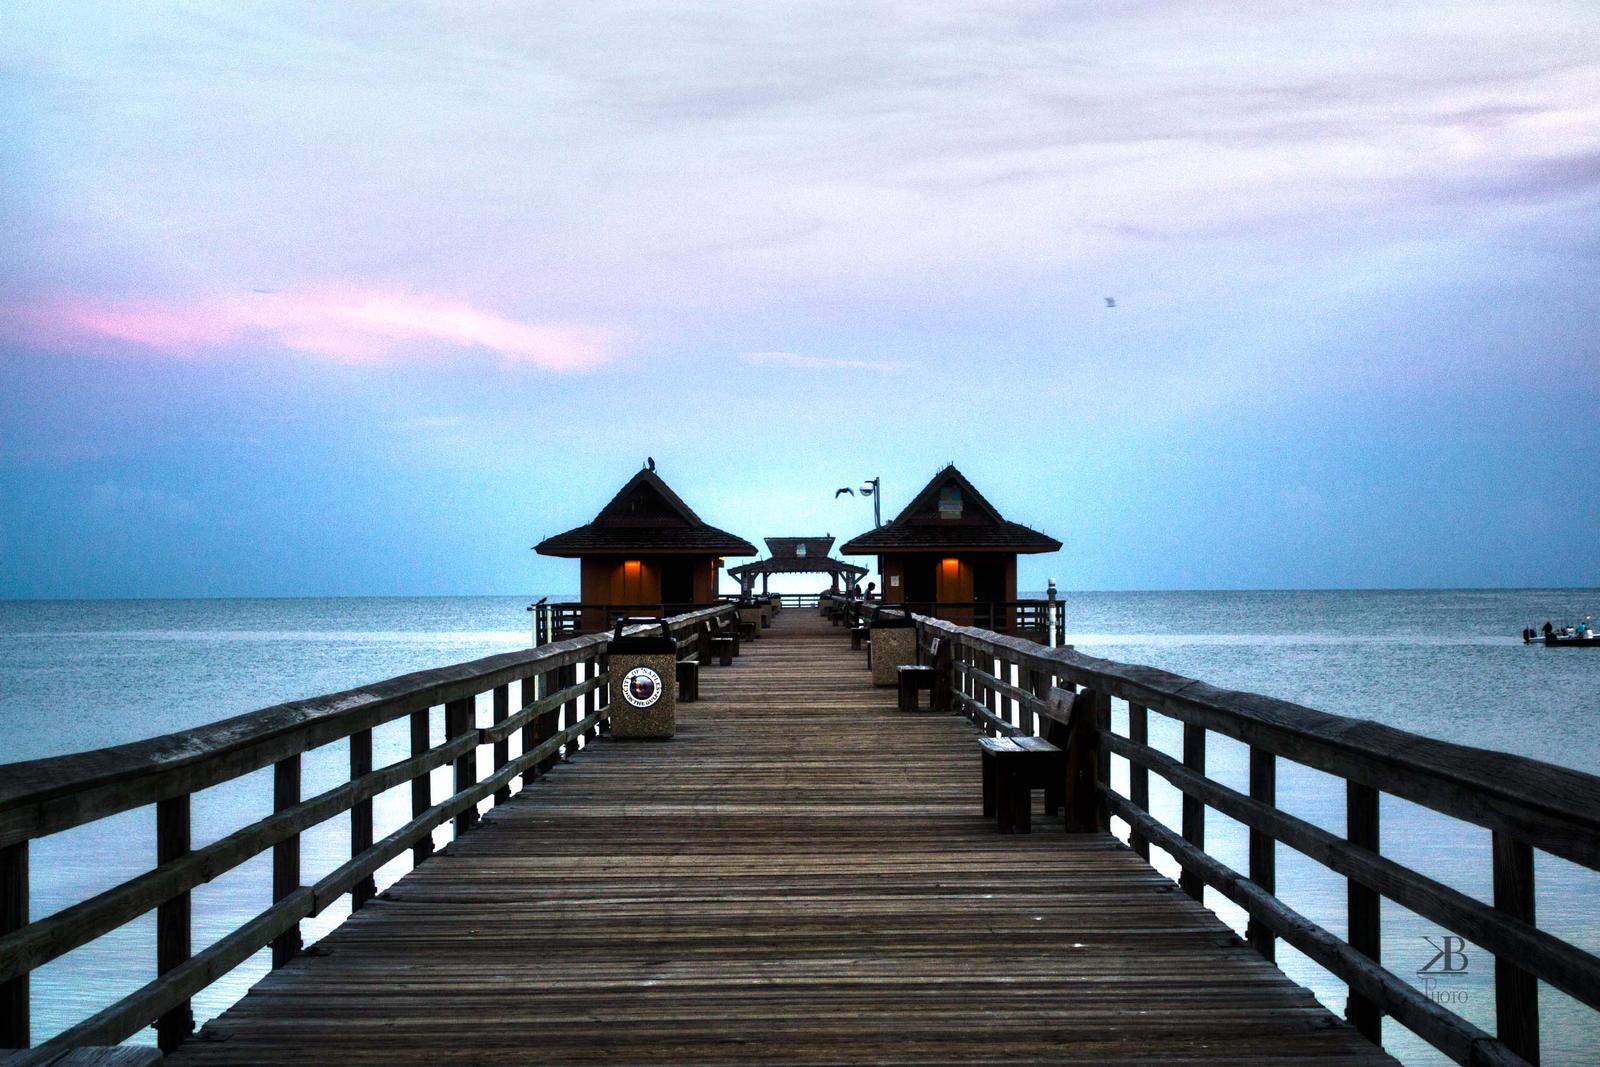 Wallpaper Naples Florida: Sunrise On Naples Pier, Florida By Bennettlizzy81 On